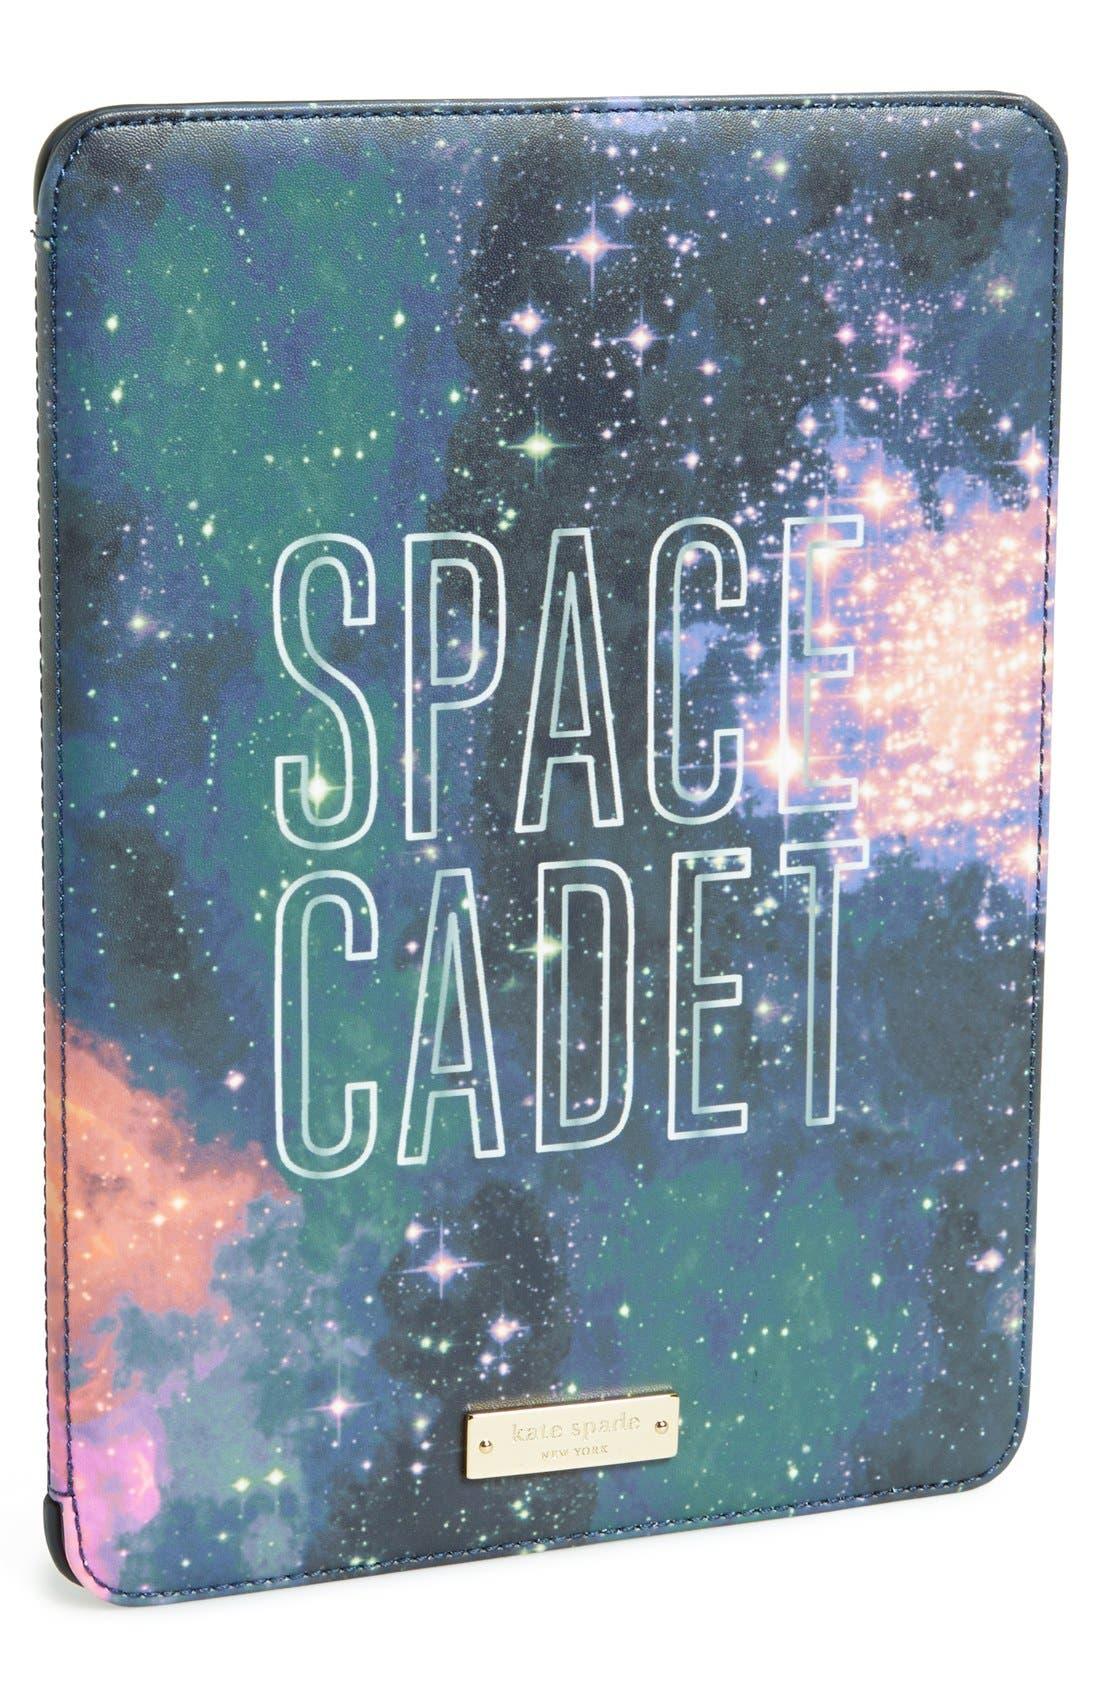 Alternate Image 1 Selected - kate spade new york 'space cadet' print iPad Air hardcase folio